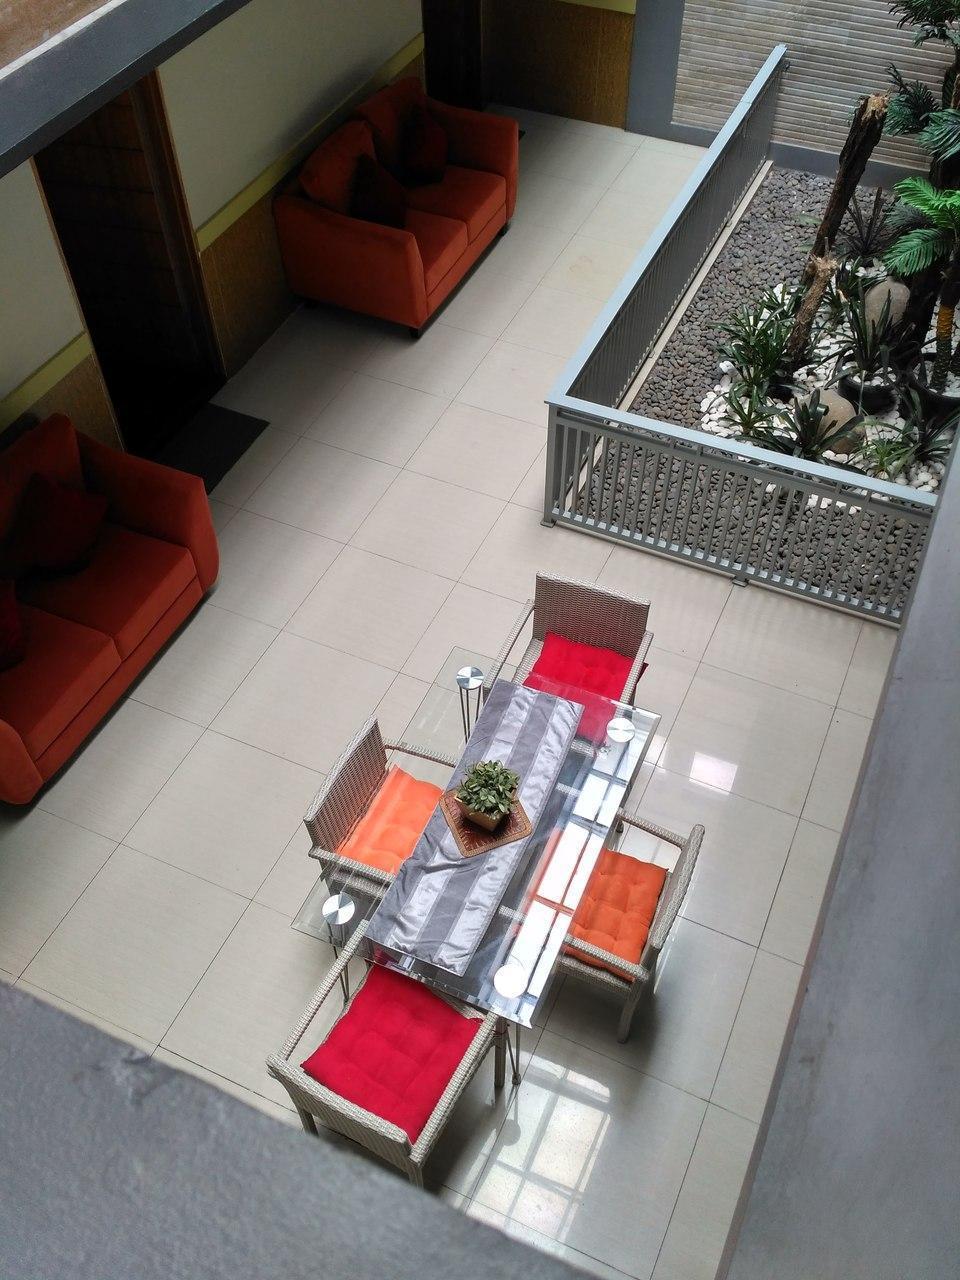 Accordia Dago Hotel Bandung - Galery 1